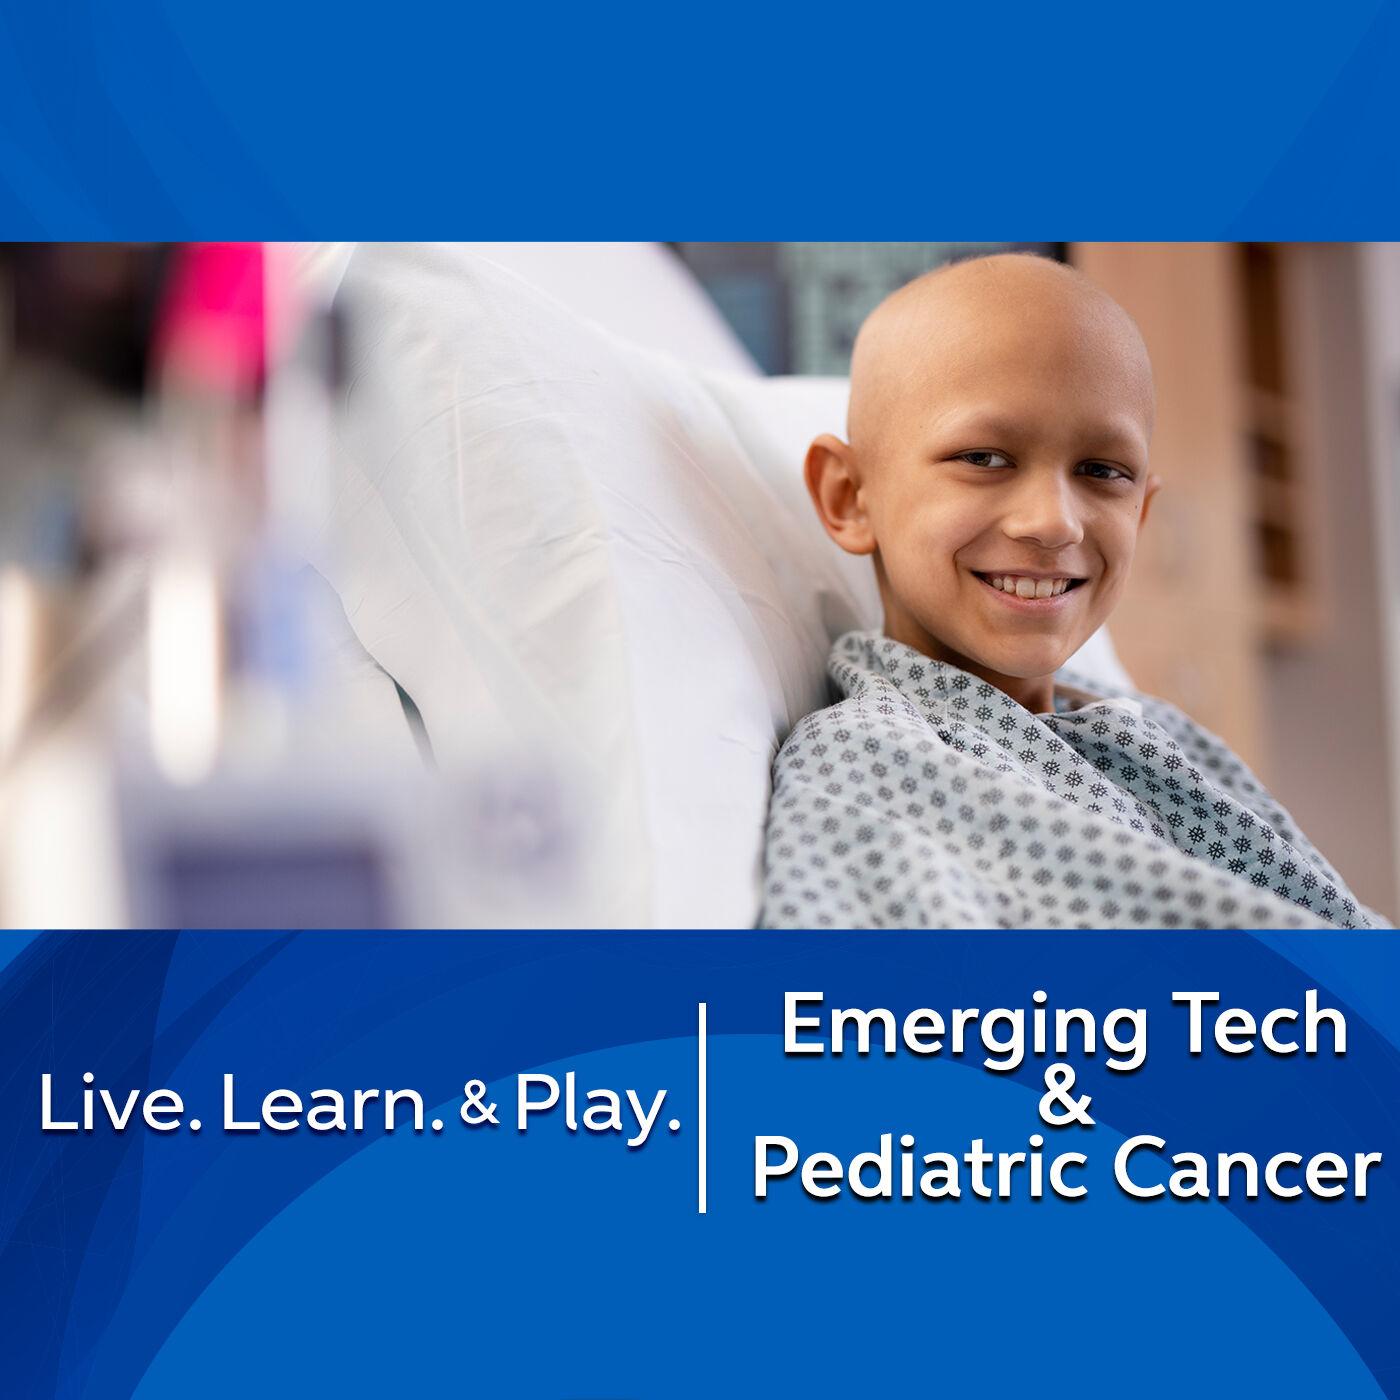 Emerging Tech & Pediatric Cancer